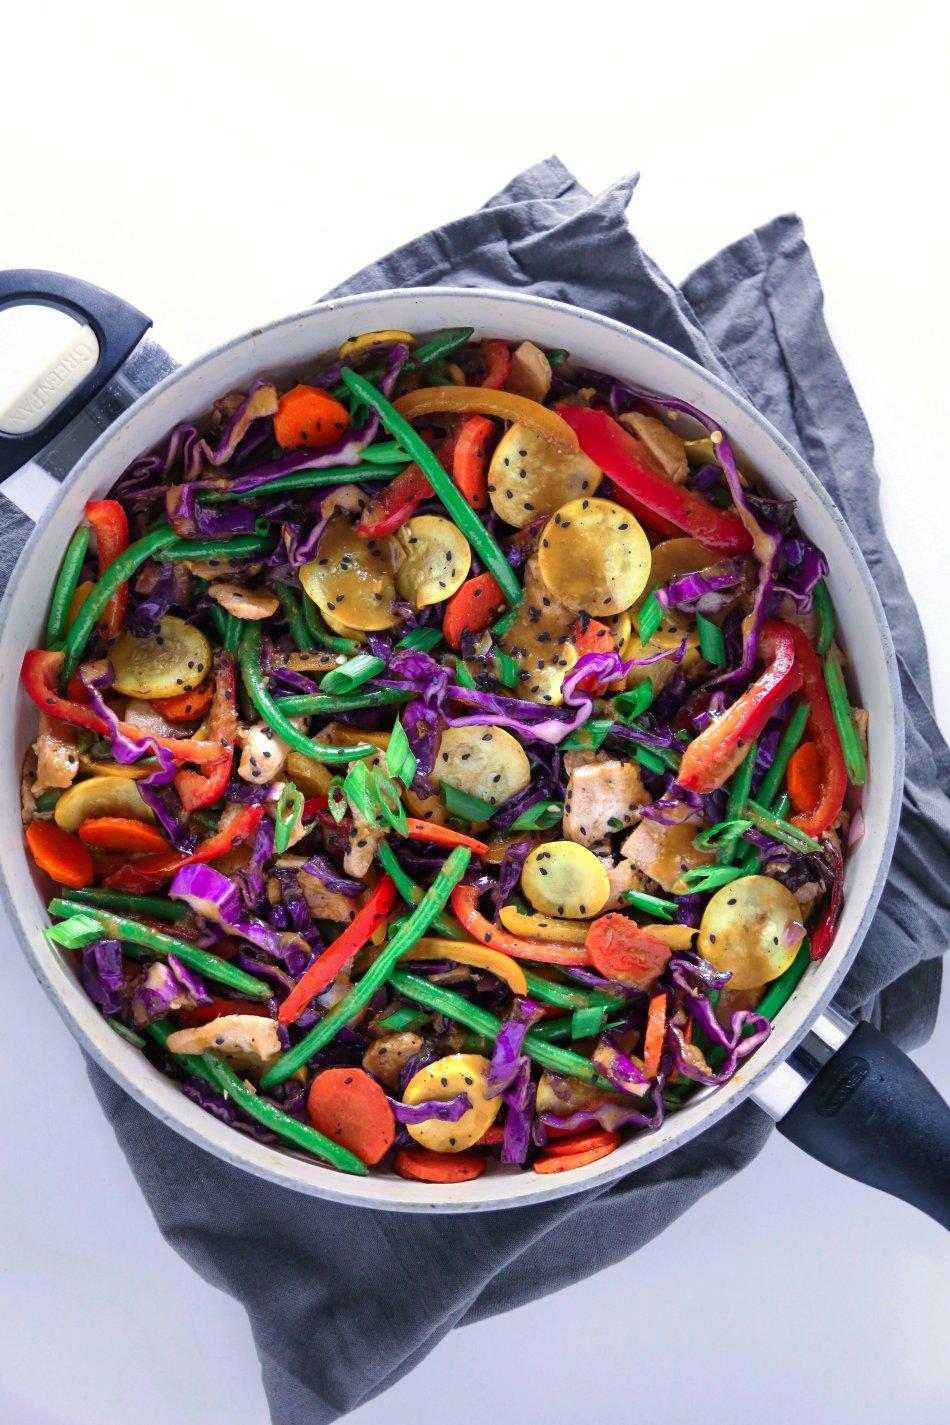 Teriyaki Stir-Fry with Cauliflower Rice | Whole30/paleo friendly. Can easily be made vegan/vegetarian.